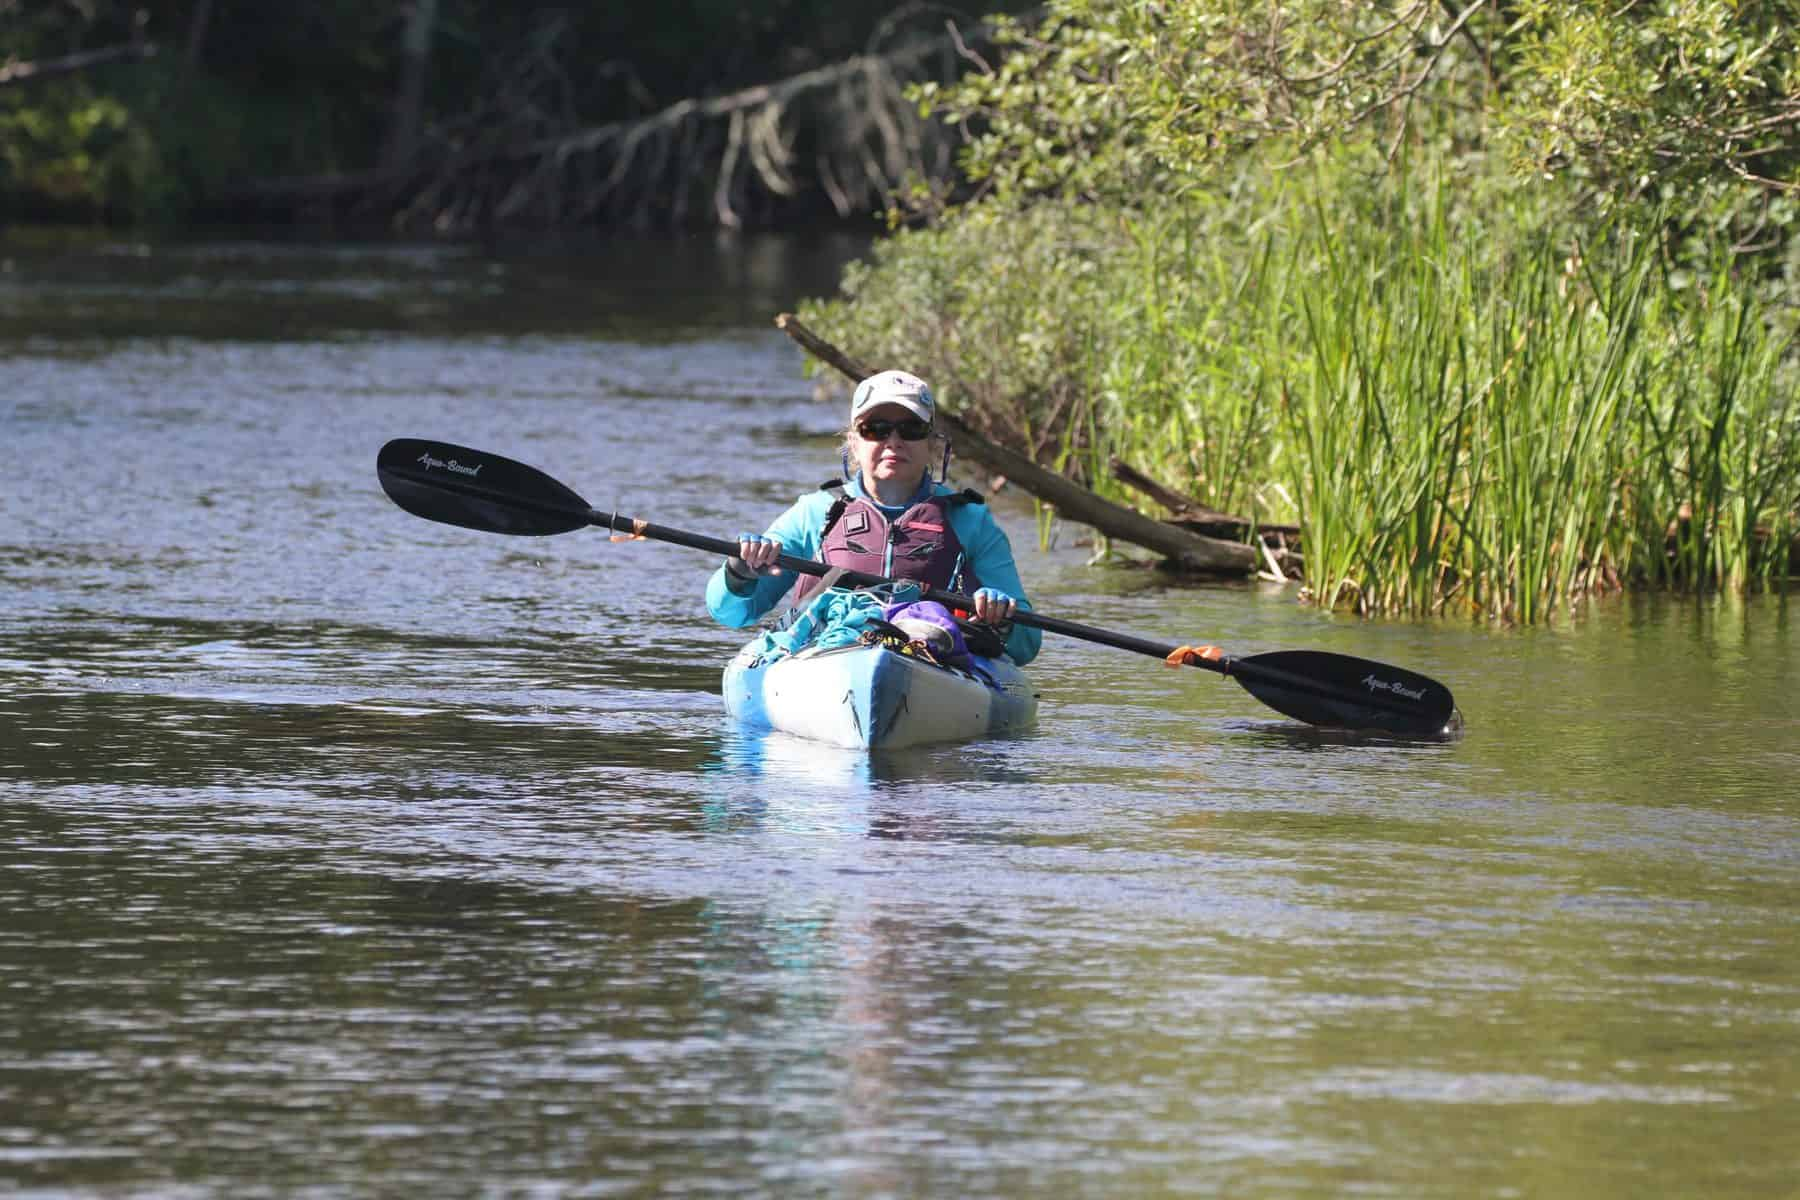 SCRA Paddle Participant Carol Dahl (Photo: Mark Sampson)